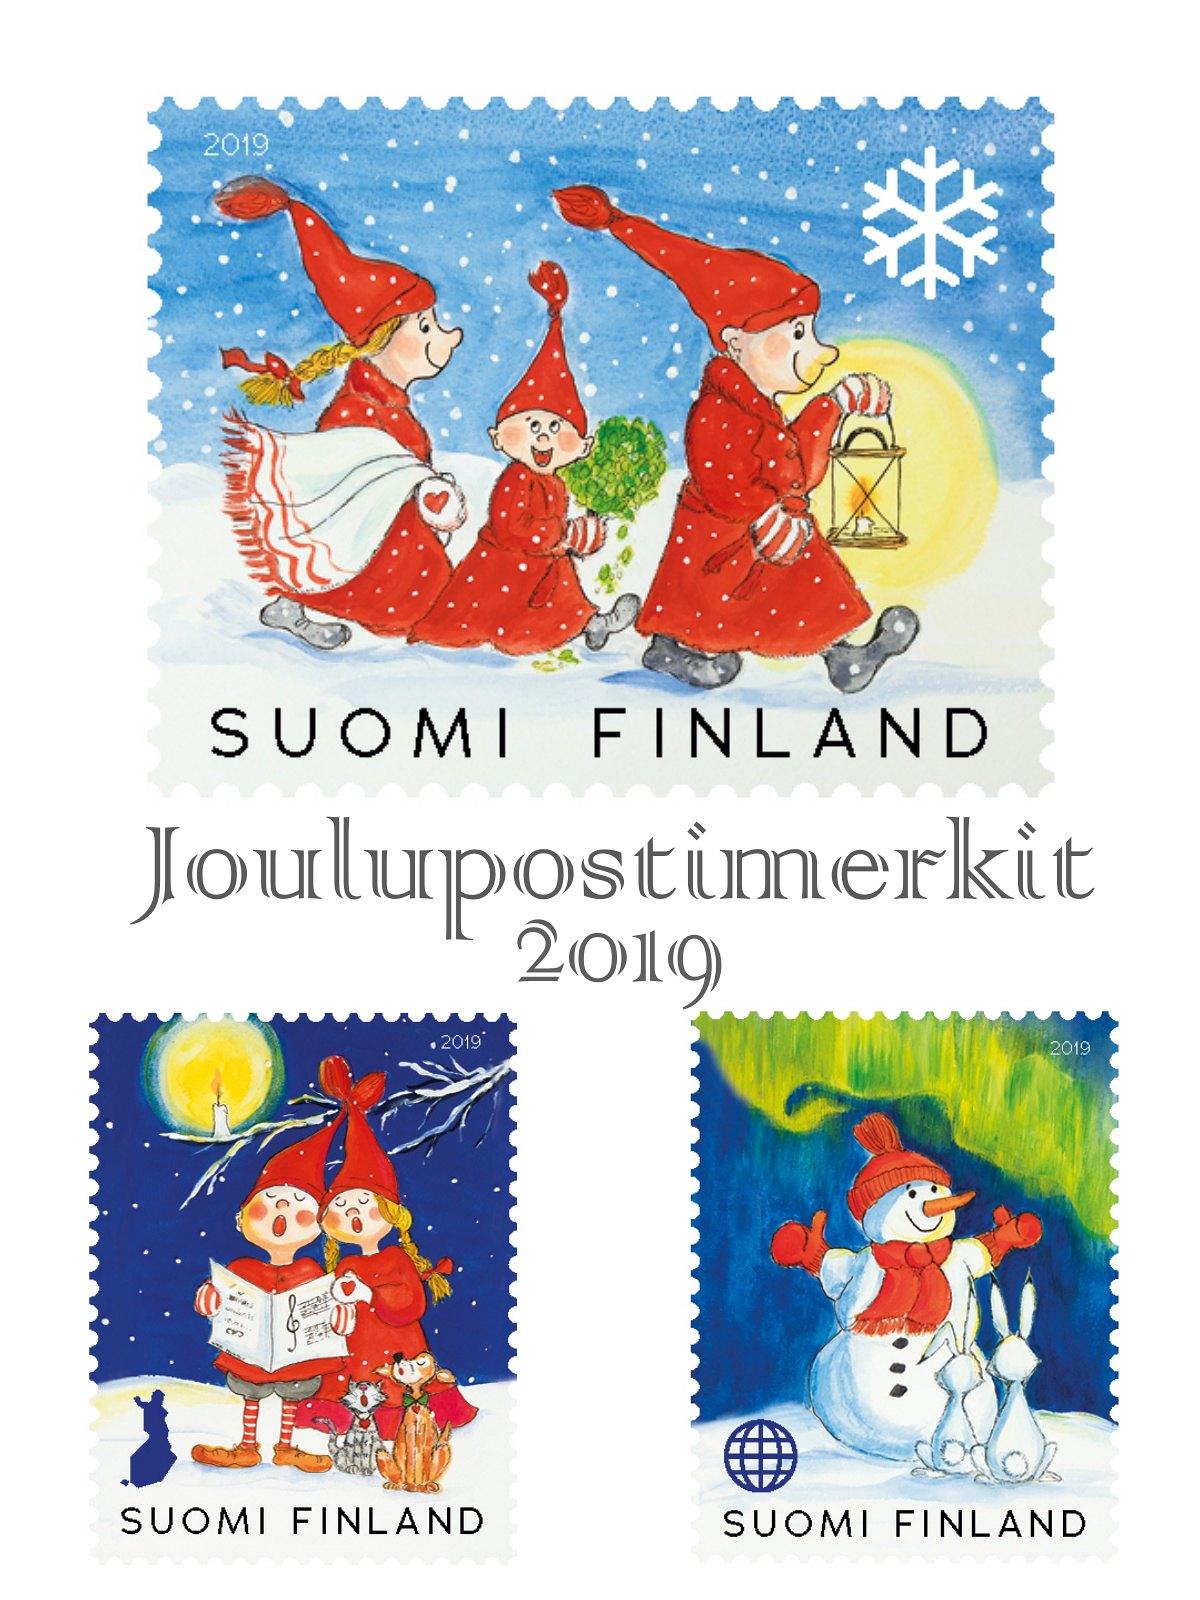 joulupostimerkit-2019